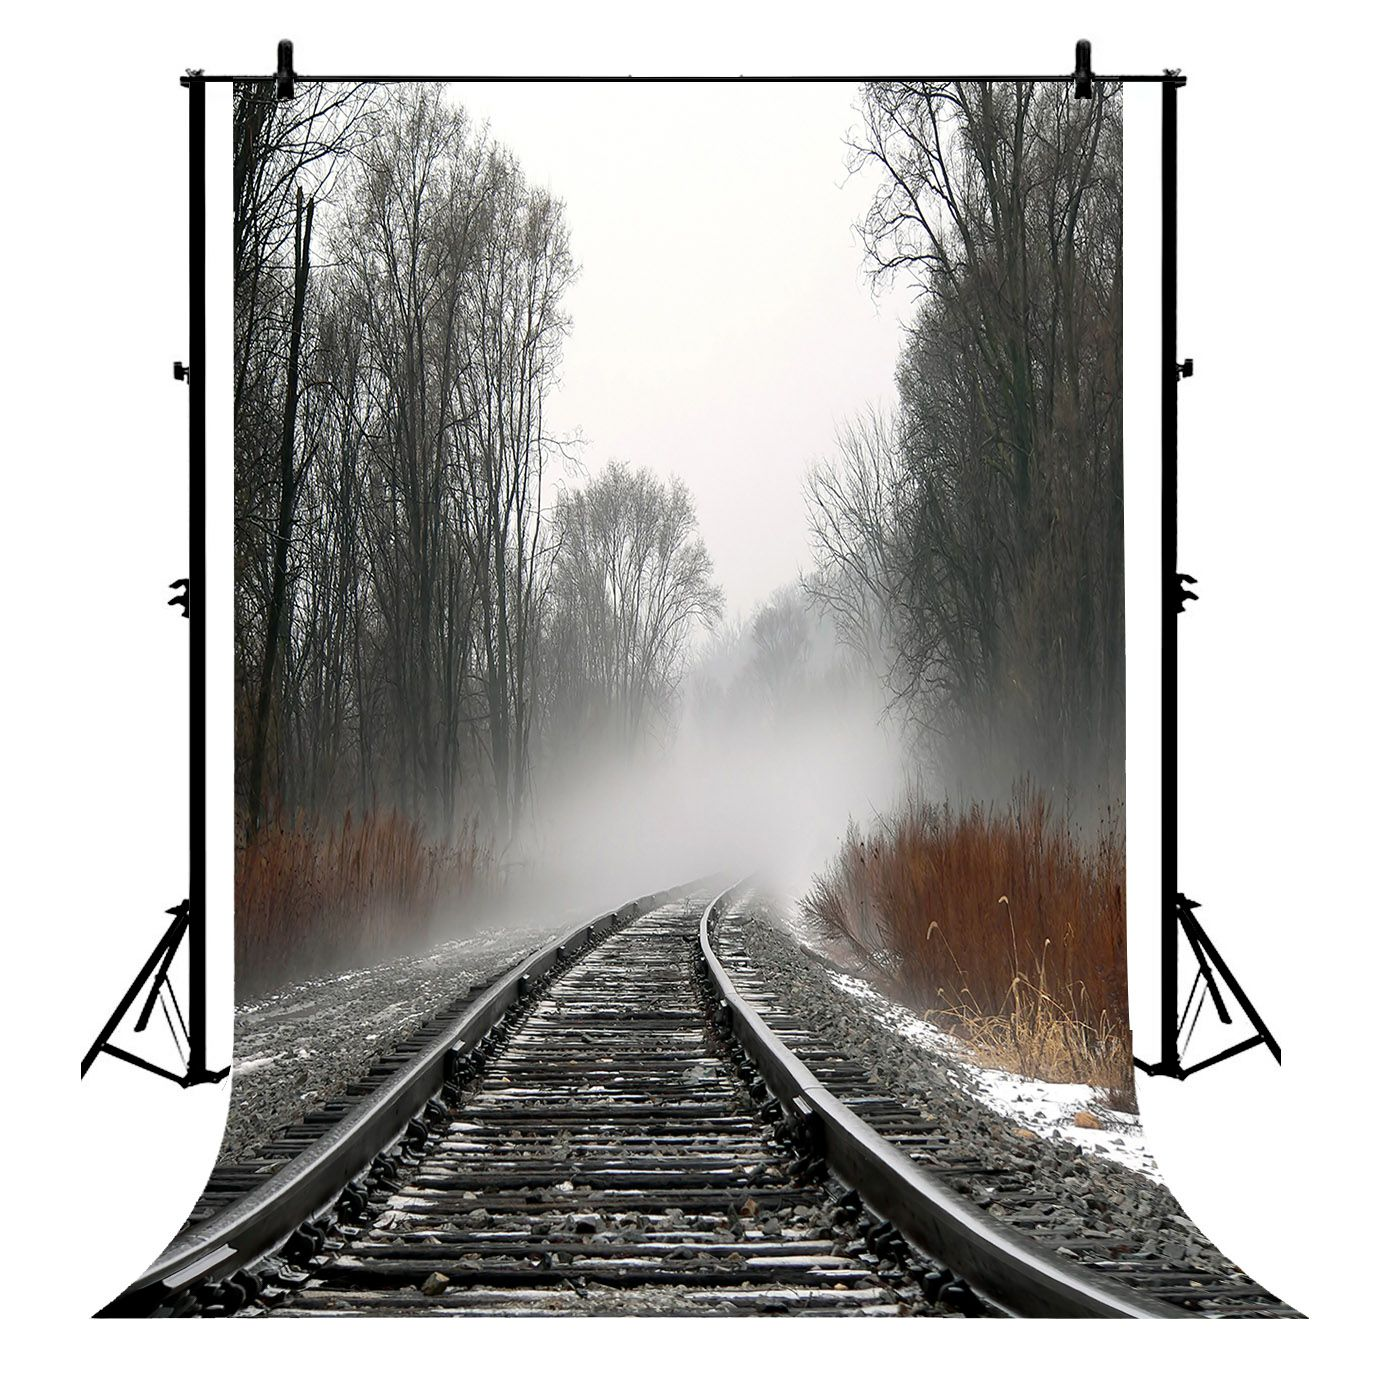 GCKG 7x5ft Train Tracks Polyester Photography Backdrop Photo Background Studio Props - image 4 de 4